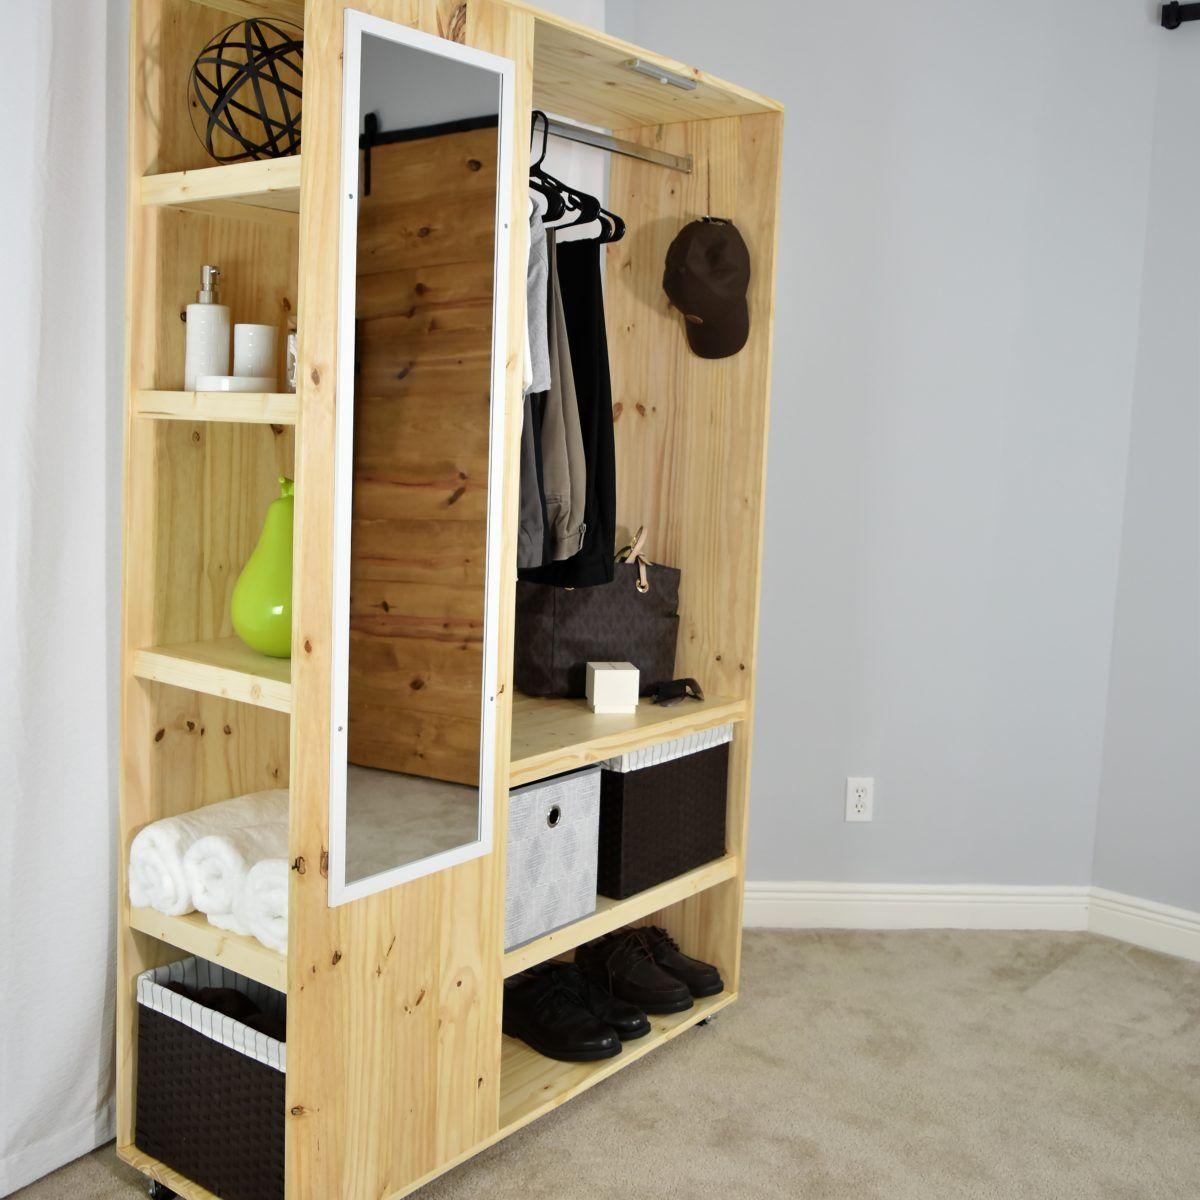 Diy Portable Closet Organizer Pdf Plan Diy Creators Diy Furniture Plans Portable Closet Diy Closet